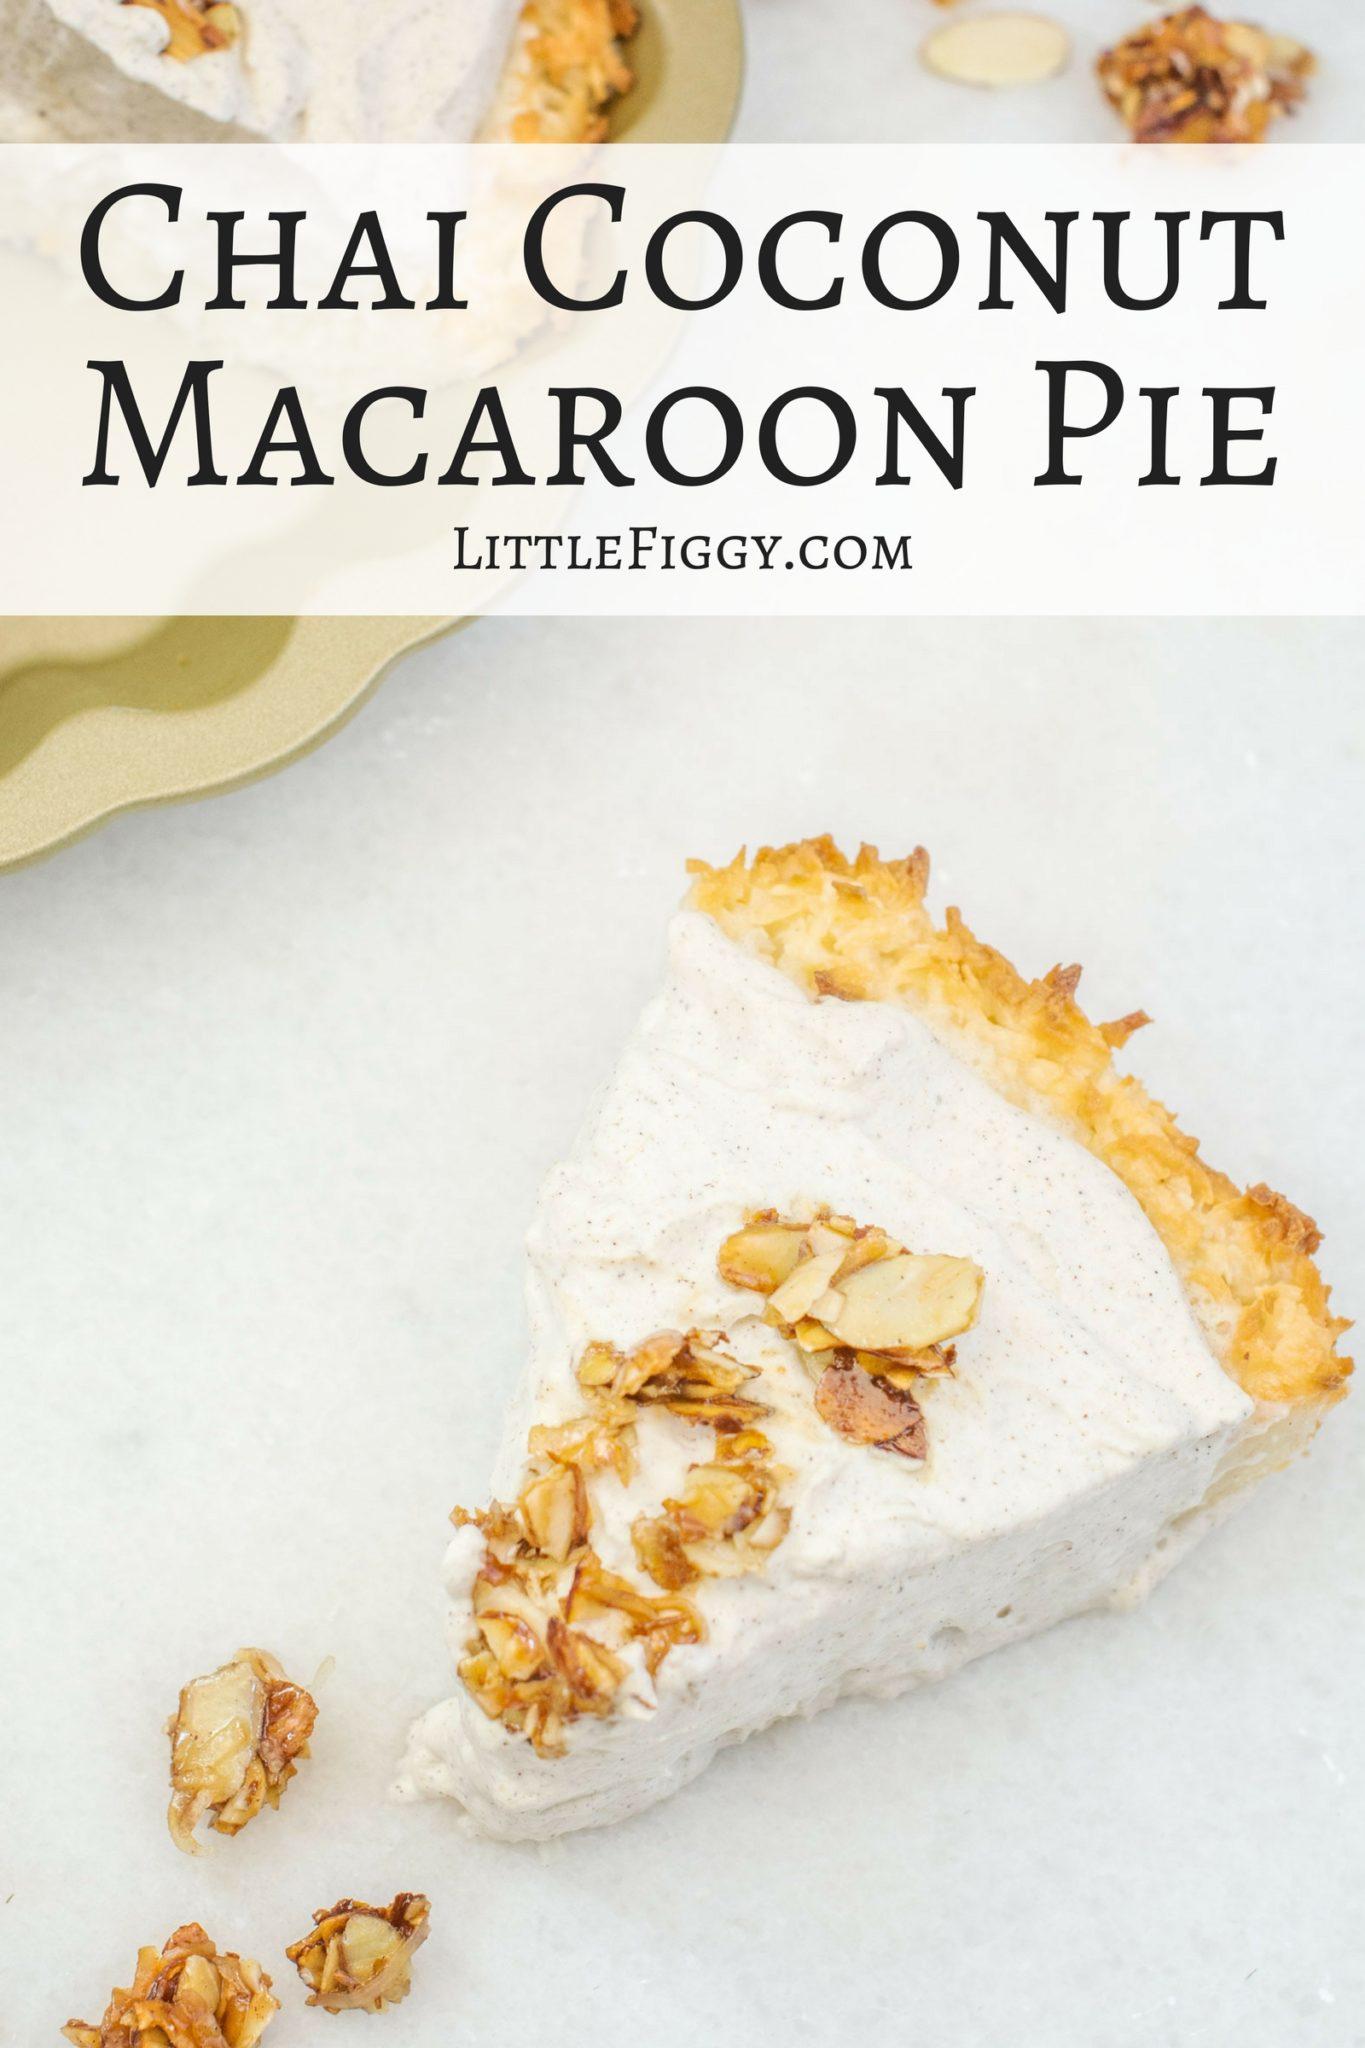 Chai Coconut Macaroon Pie